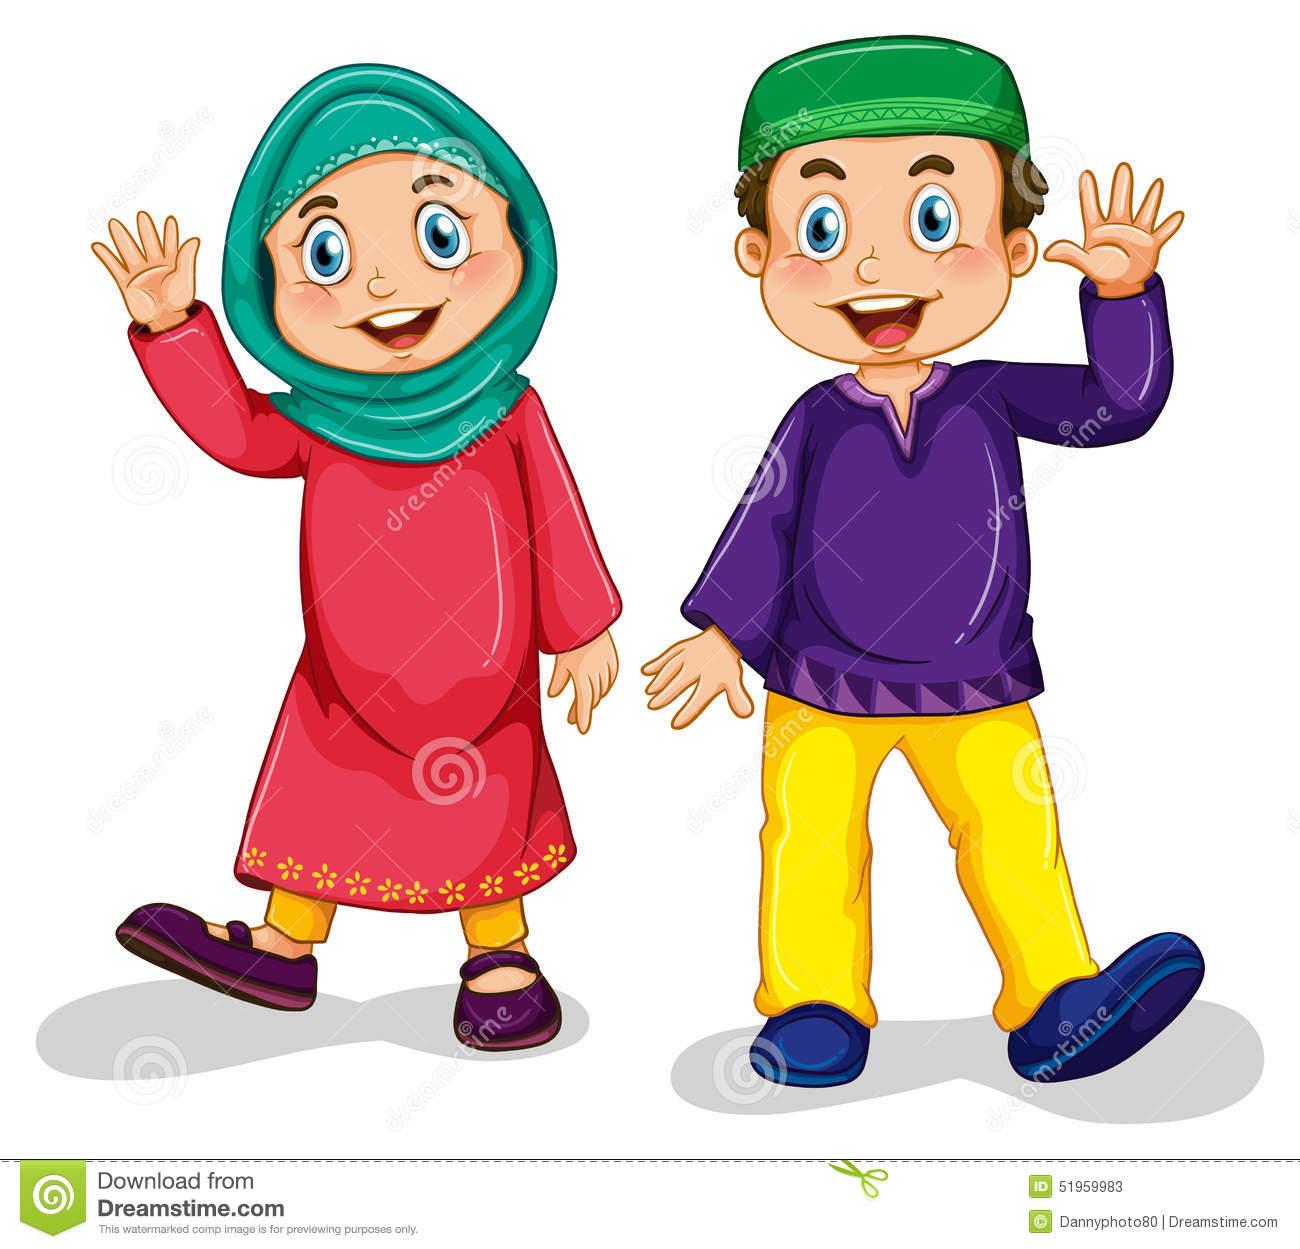 muslim clip art free clipart panda free clipart images rh clipartpanda com muslim family clipart muslim cute clipart